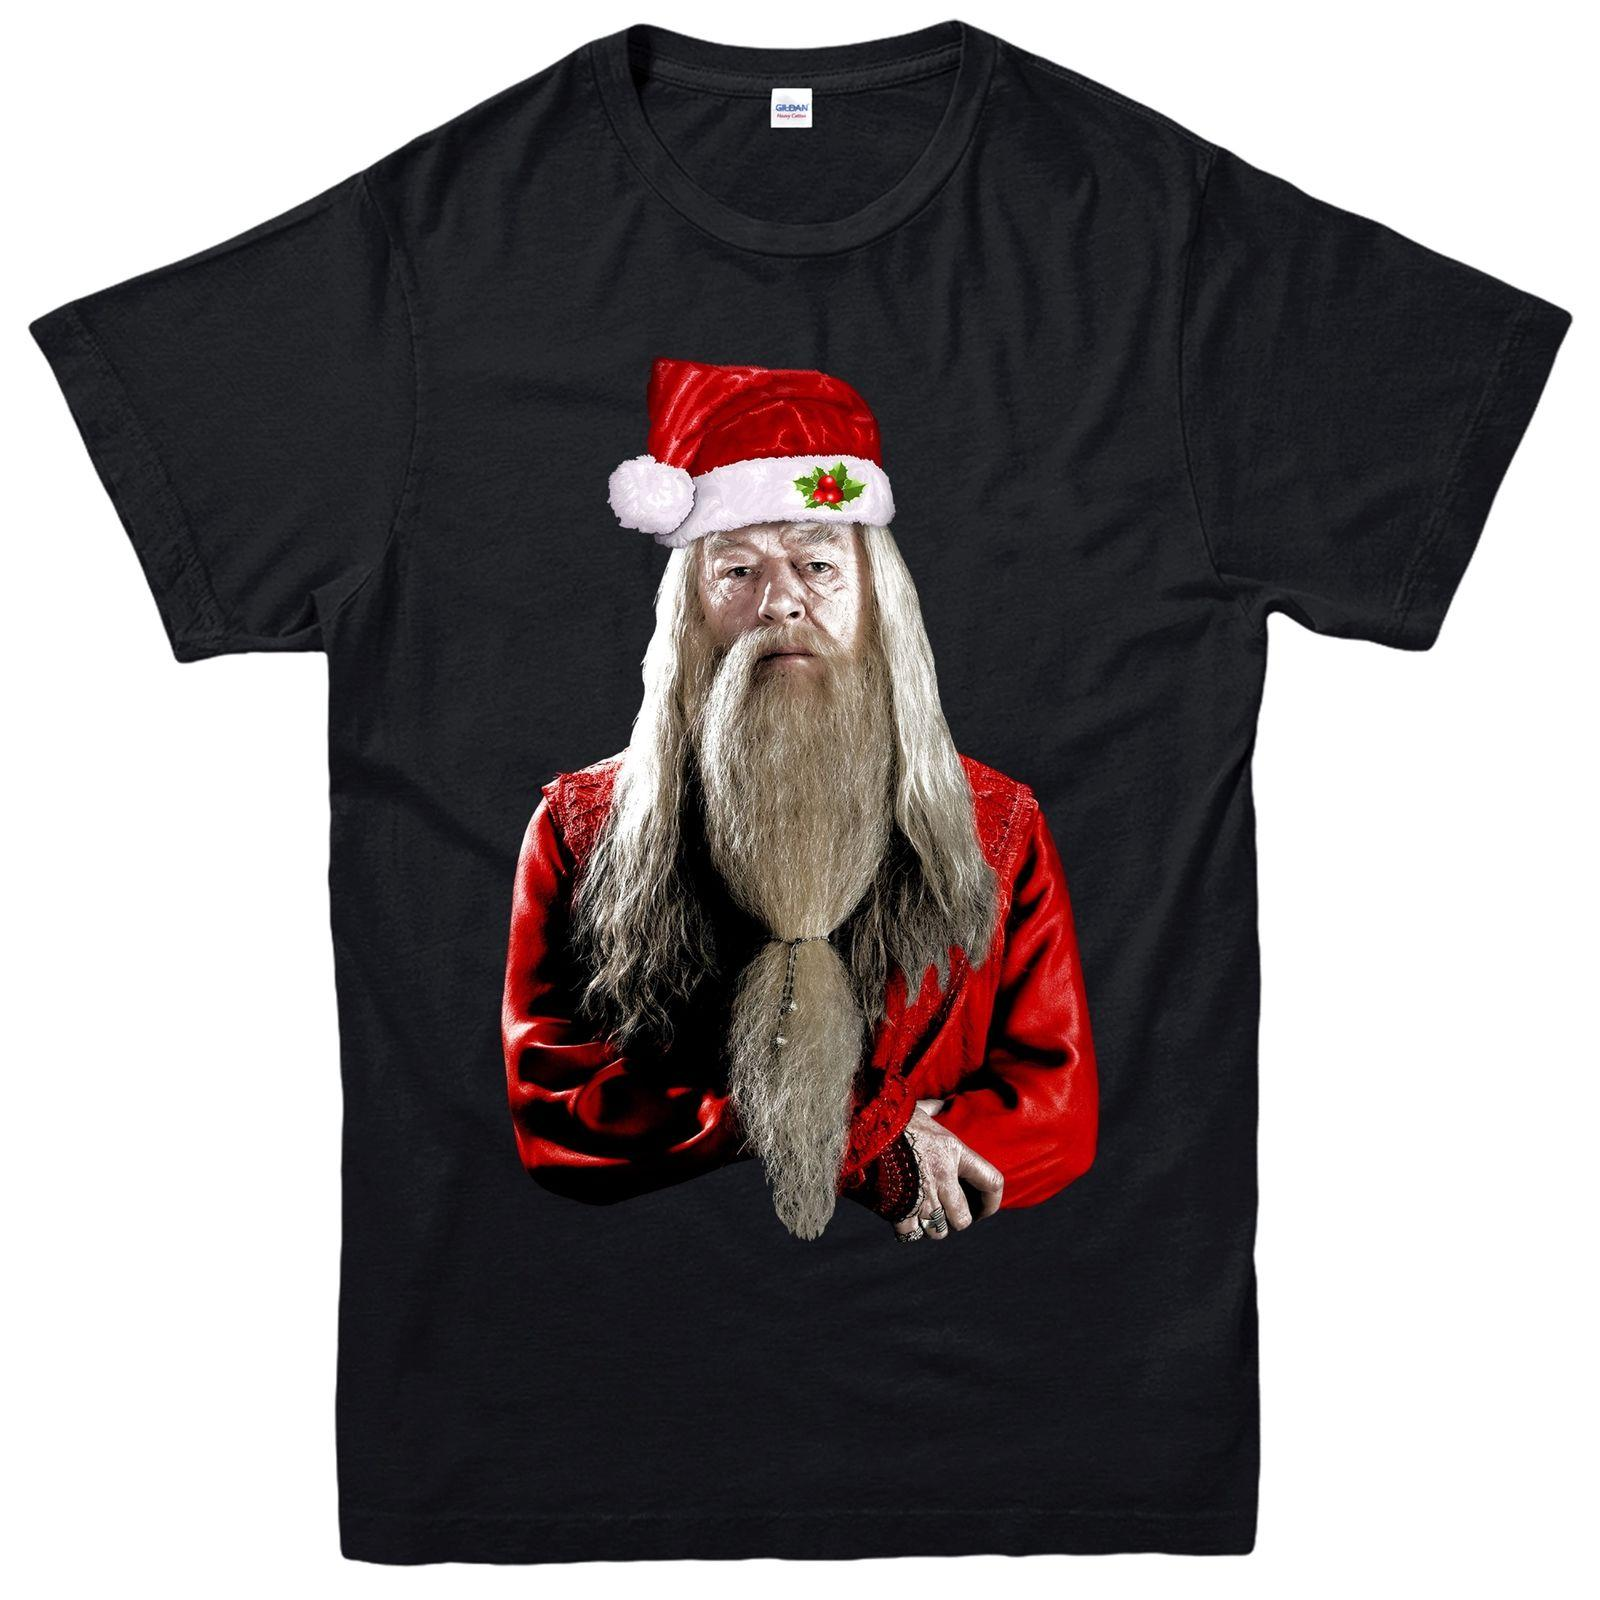 Harry Potter Christmas Shirt.Harry Potter Christmas T Shirt Dumbledore Xmas Festive Adult Kids Tee Top Newest Top Tees Fashion Style Men Tee